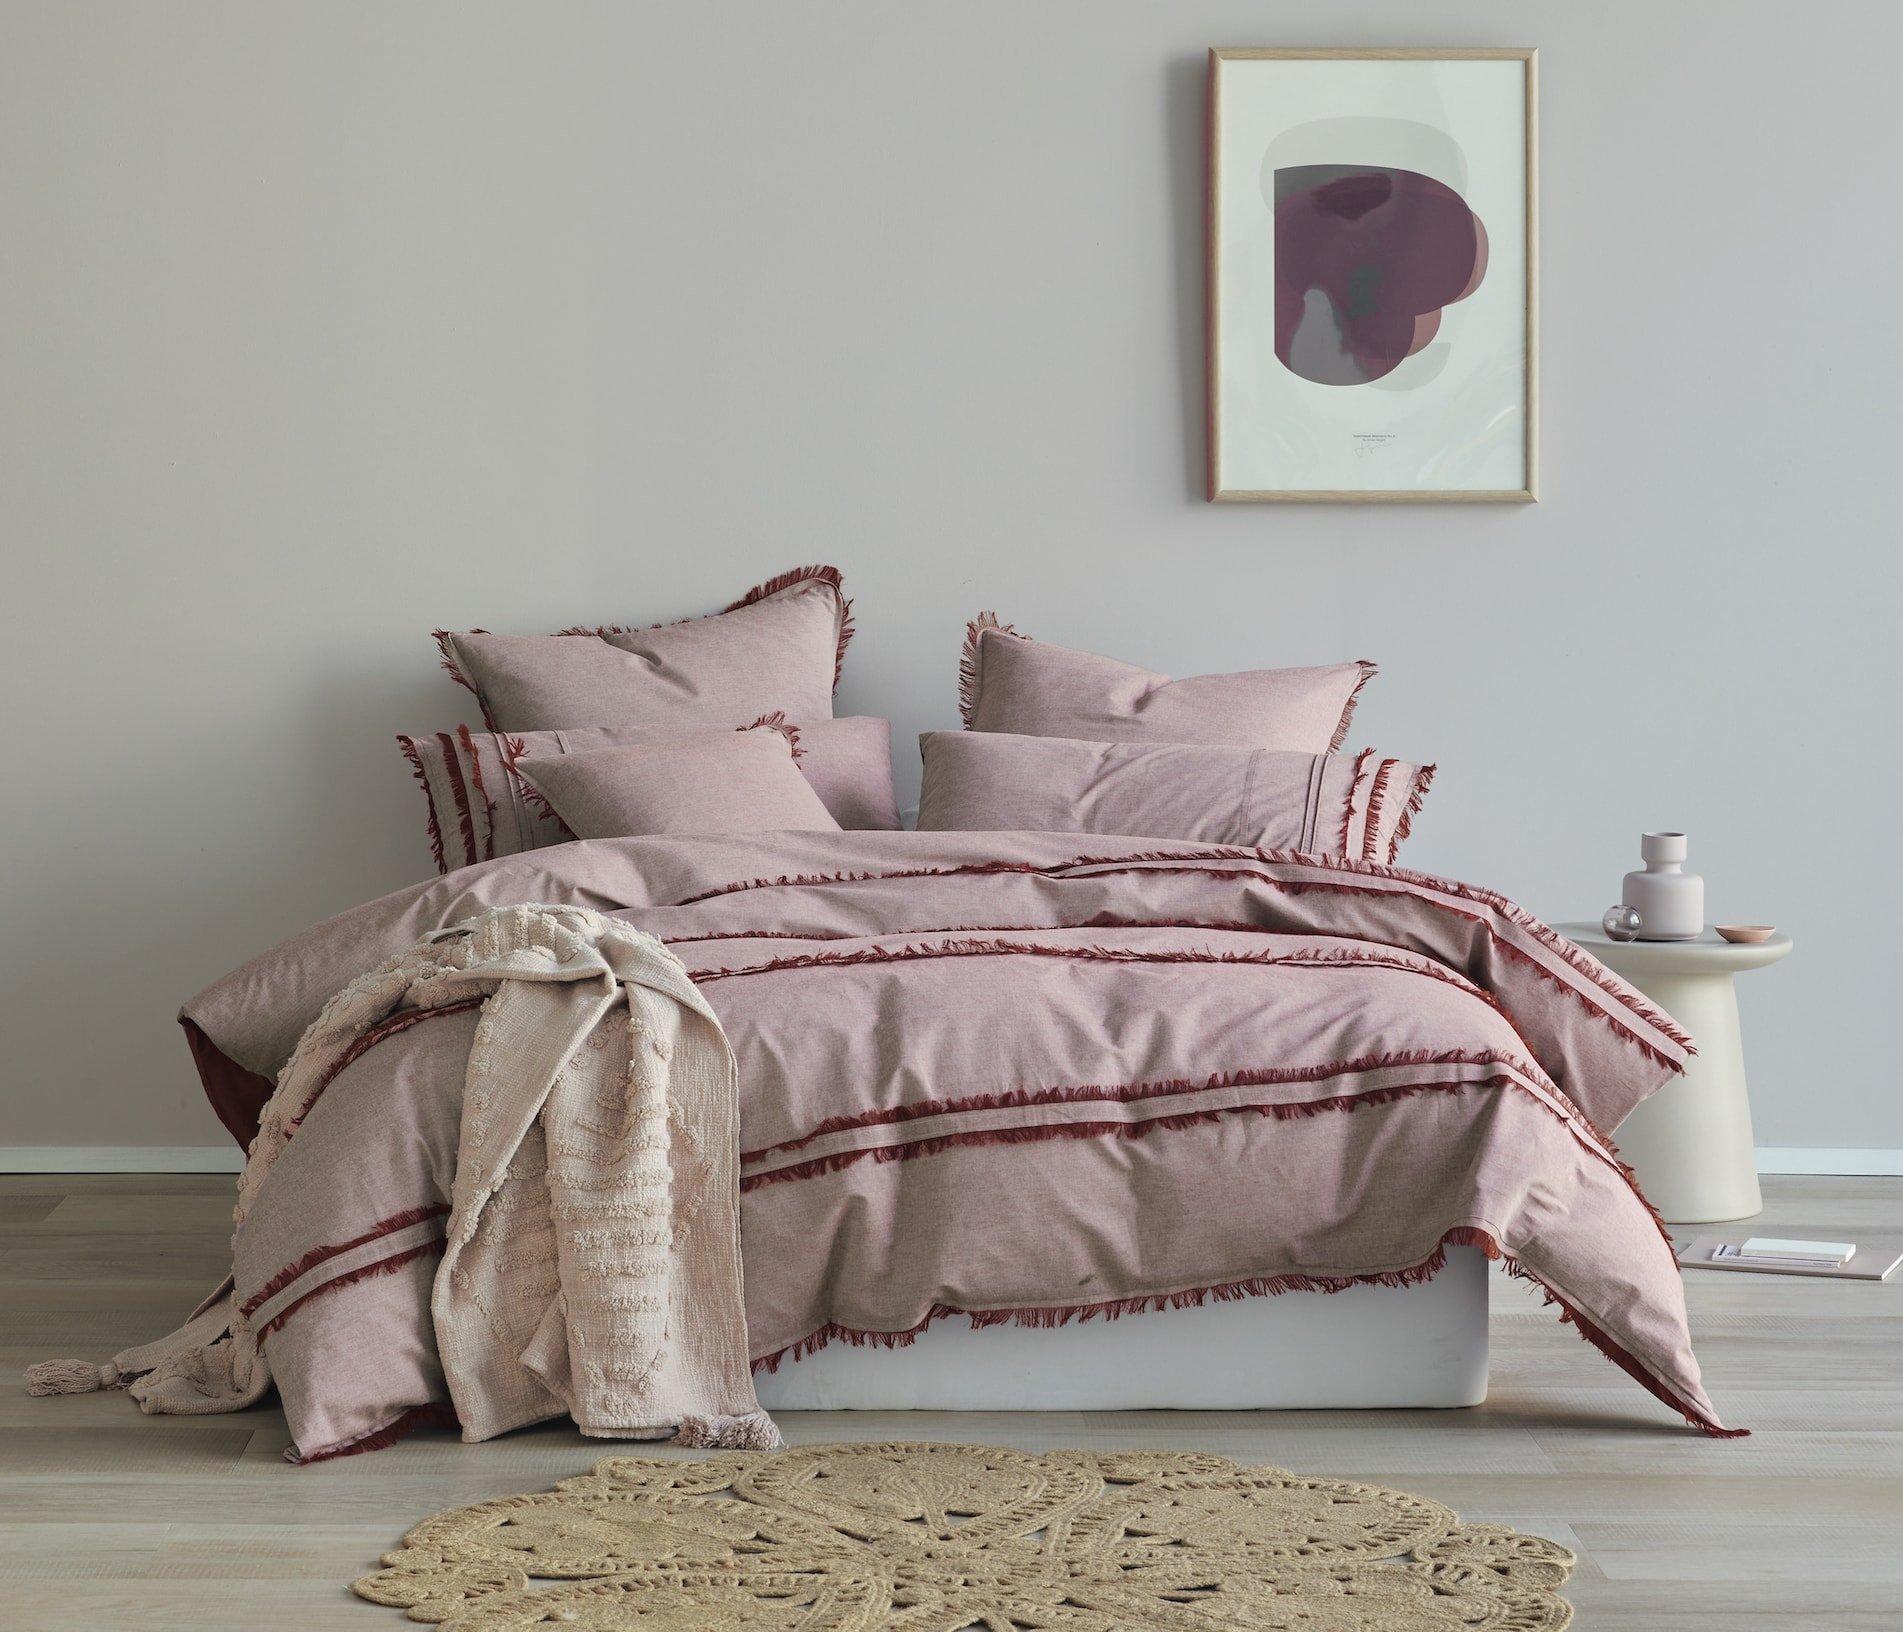 lorraine lea st moritz quitl cover set dark pink with red trim bedding